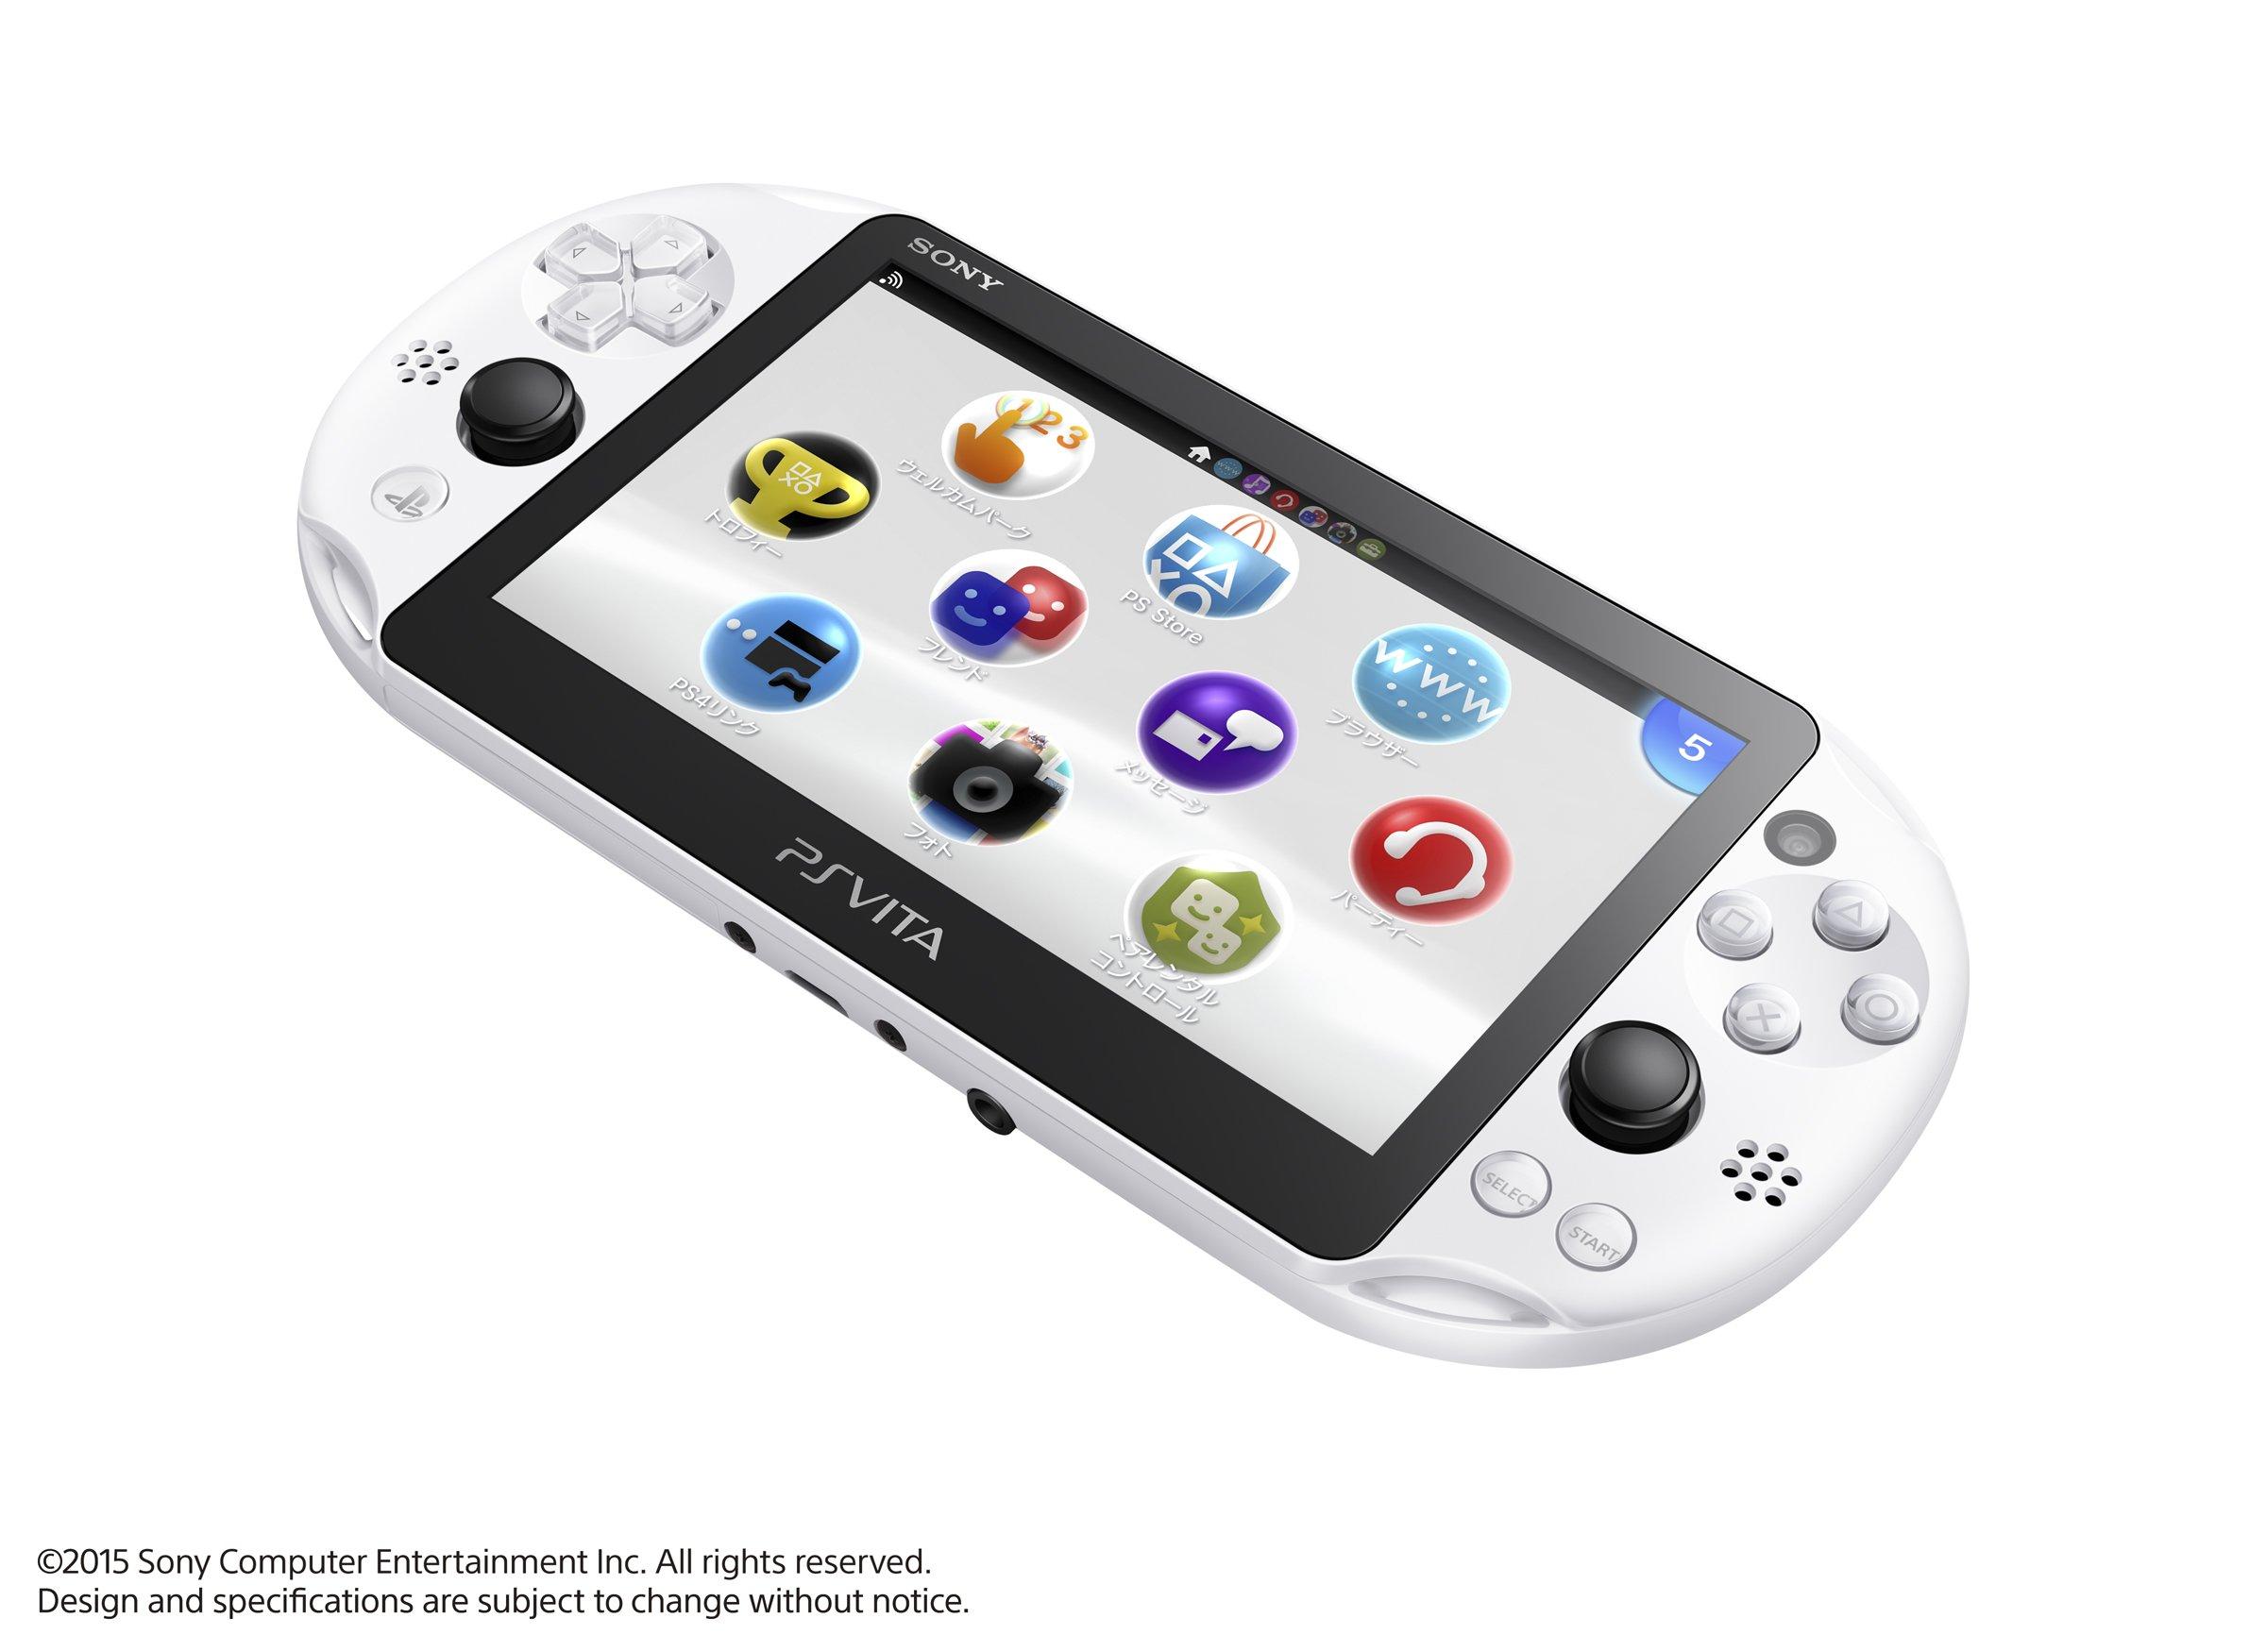 PlayStation Vita Wi-Fi model Glacier White (PCH-2000ZA22) Japanese Ver. Japan Import by Sony (Image #2)